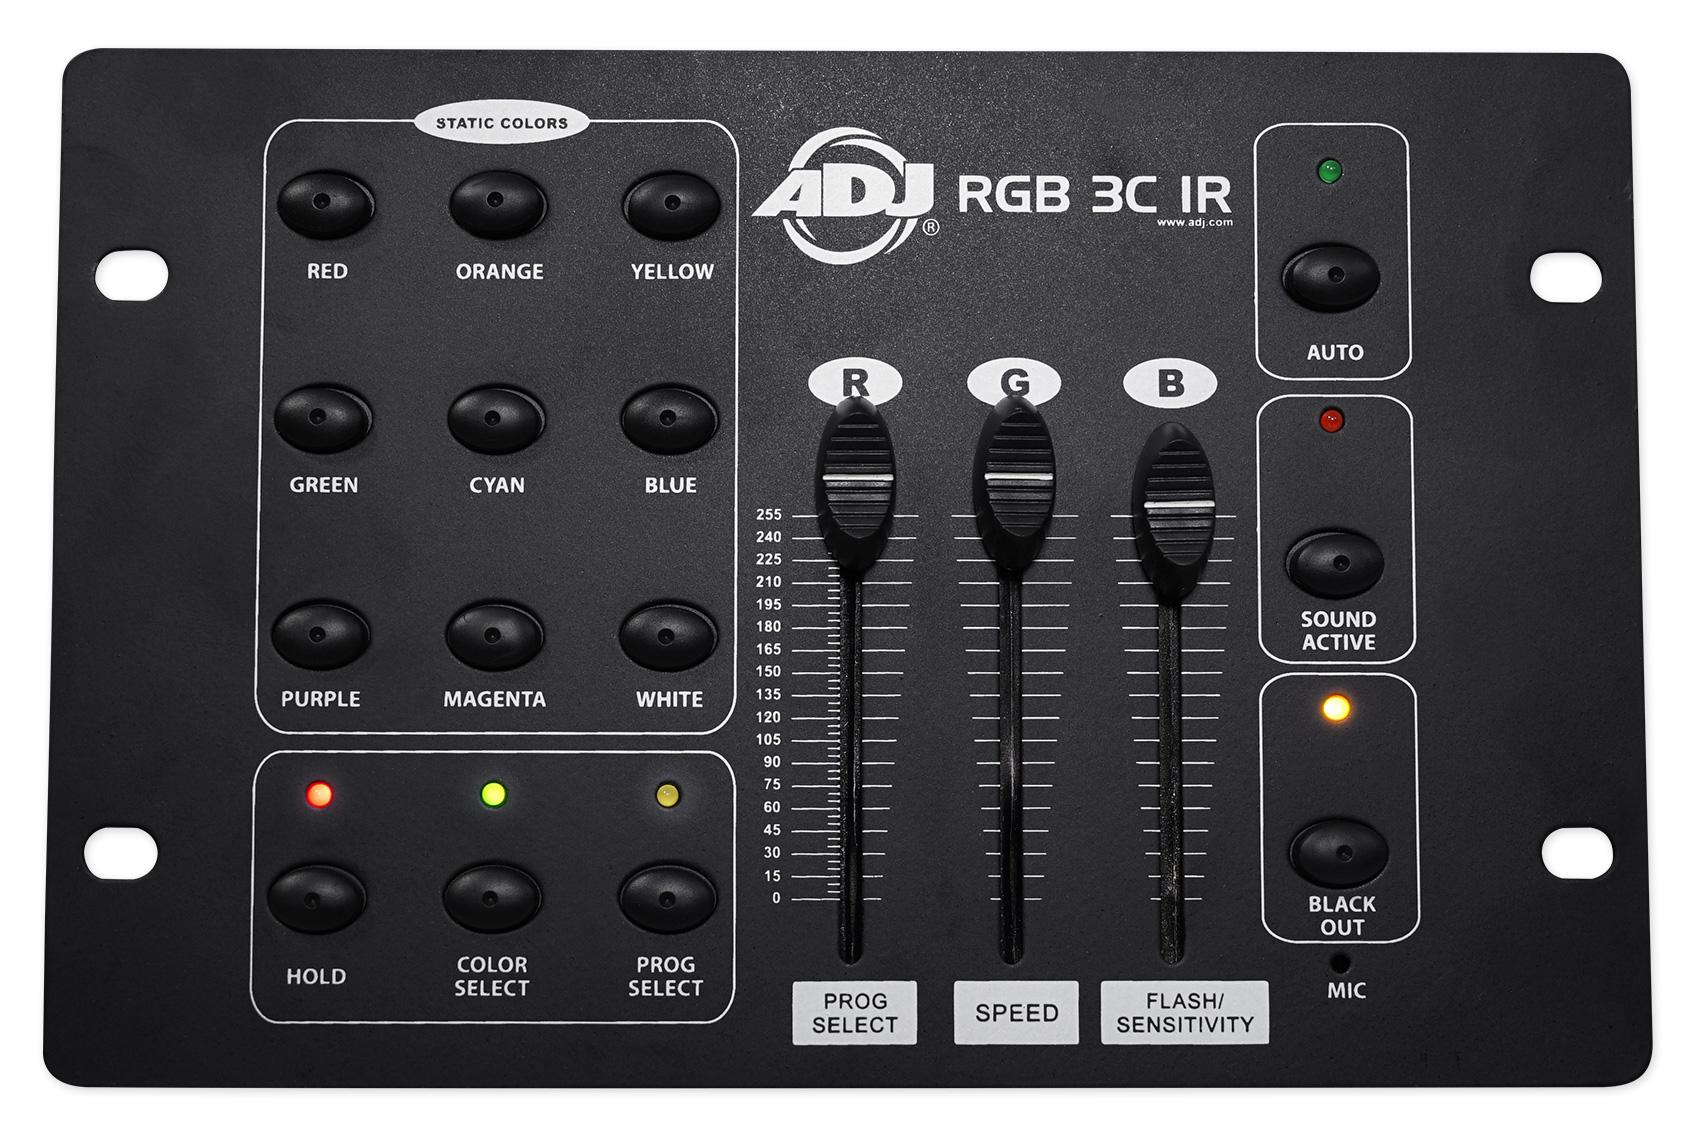 RGB3C IR ADJ Products Stage Lighting Controller